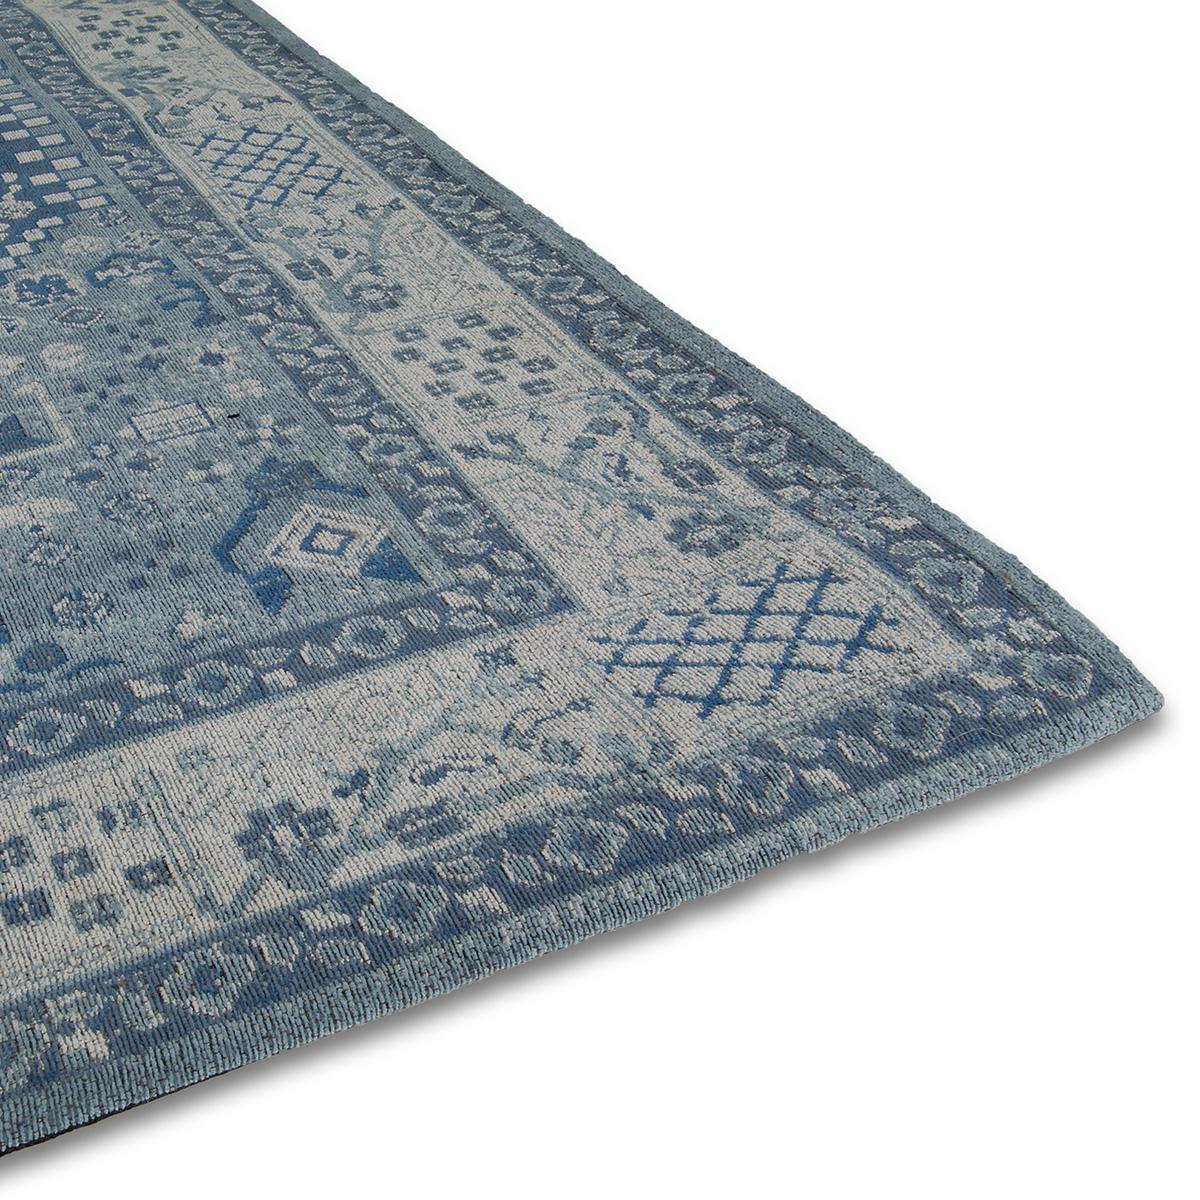 Vloerkleed Brinker Avanti Azur Blue | 200 x 290 cm